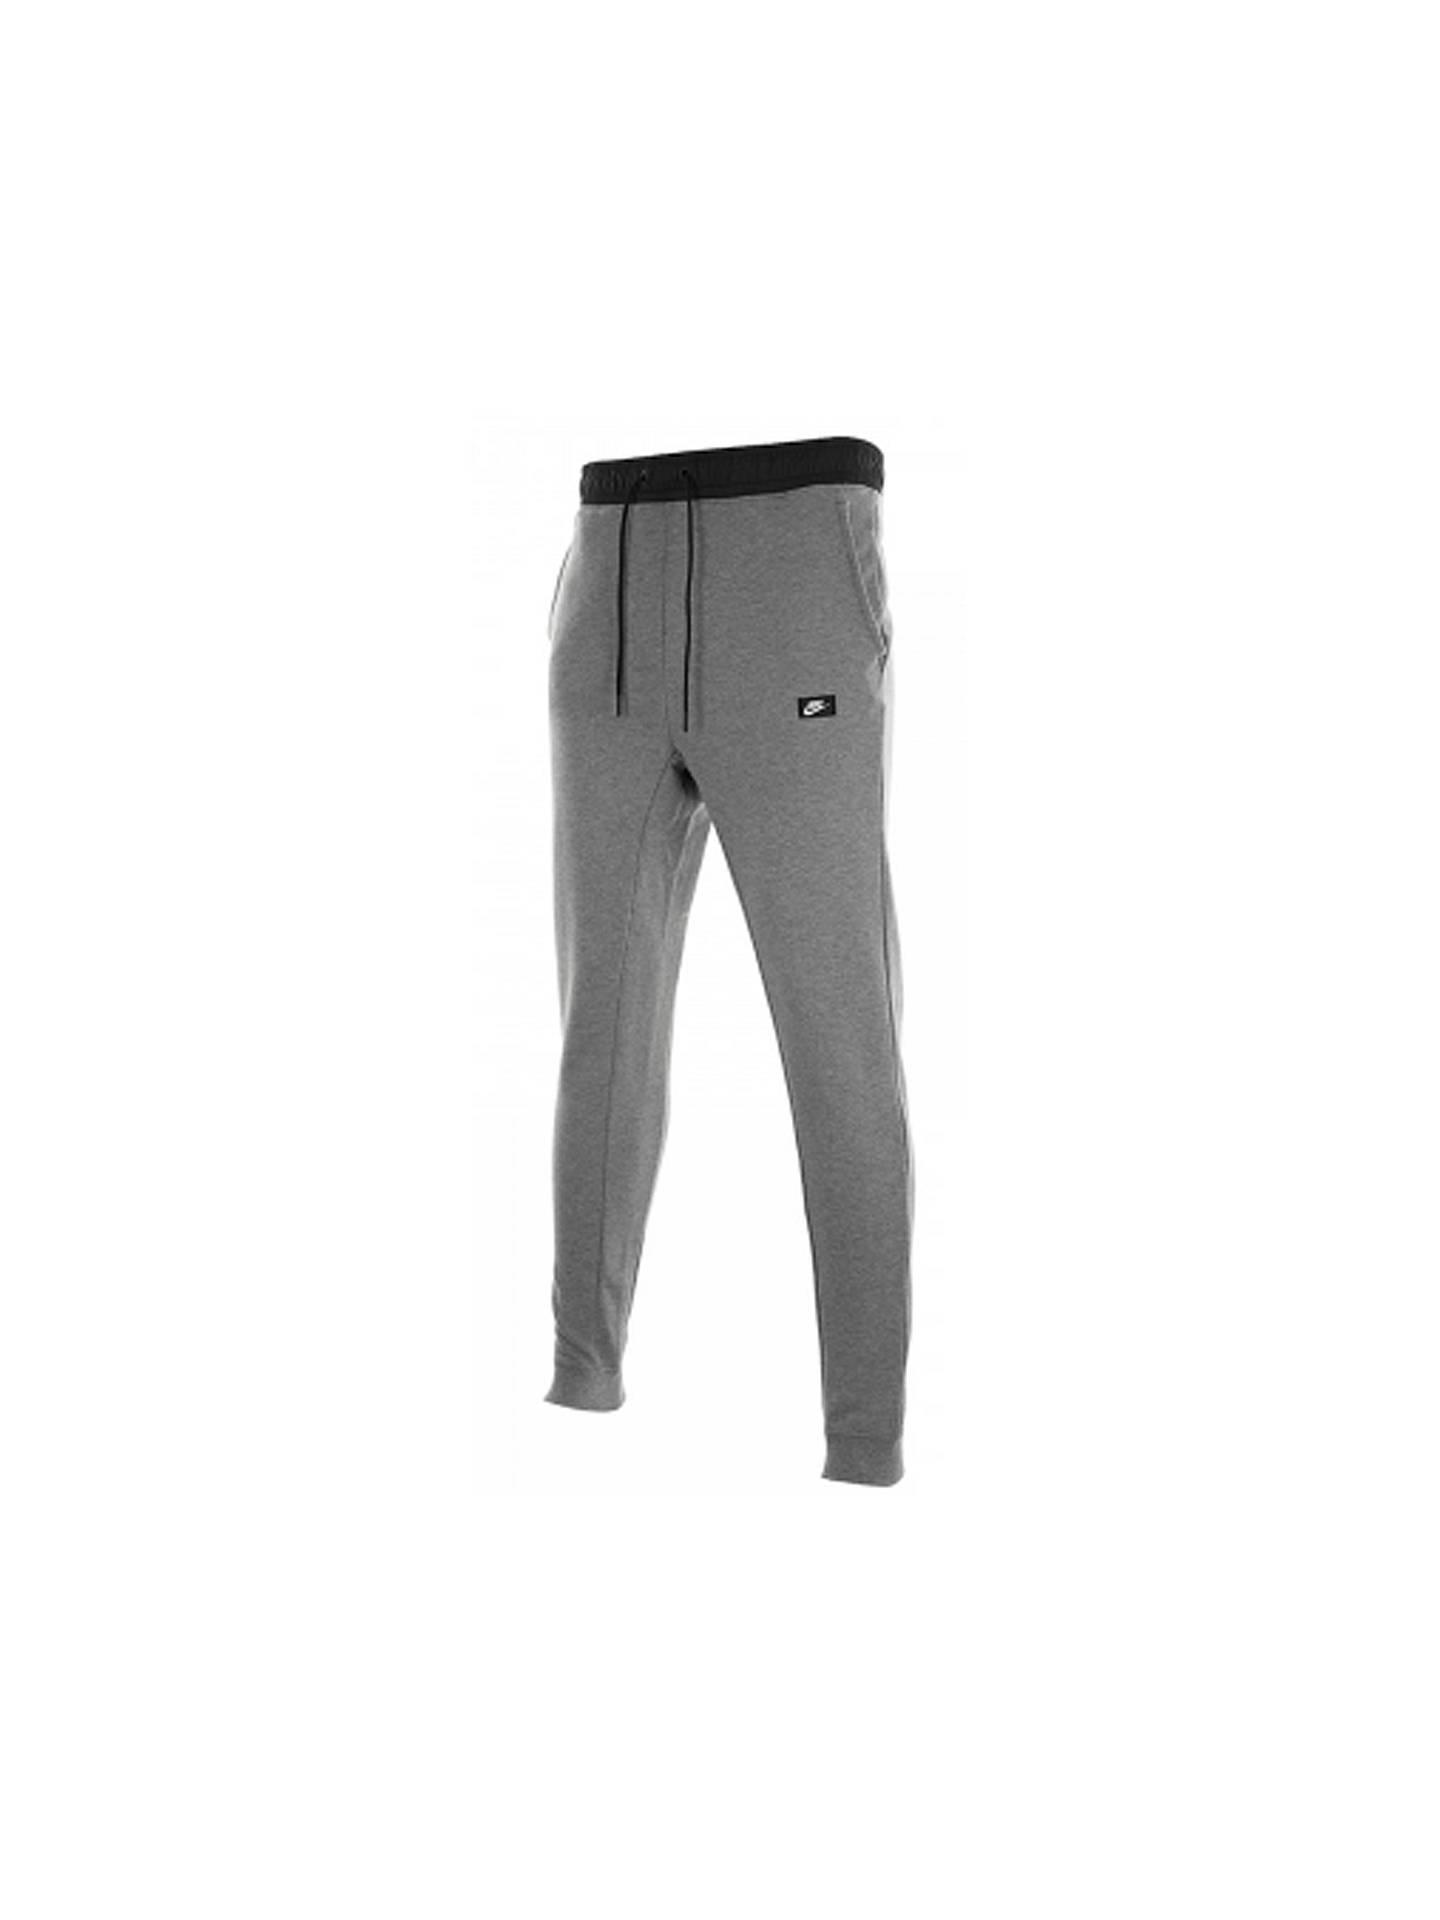 Nike Sportswear Modern Tracksuit Bottoms f2b47d135b57